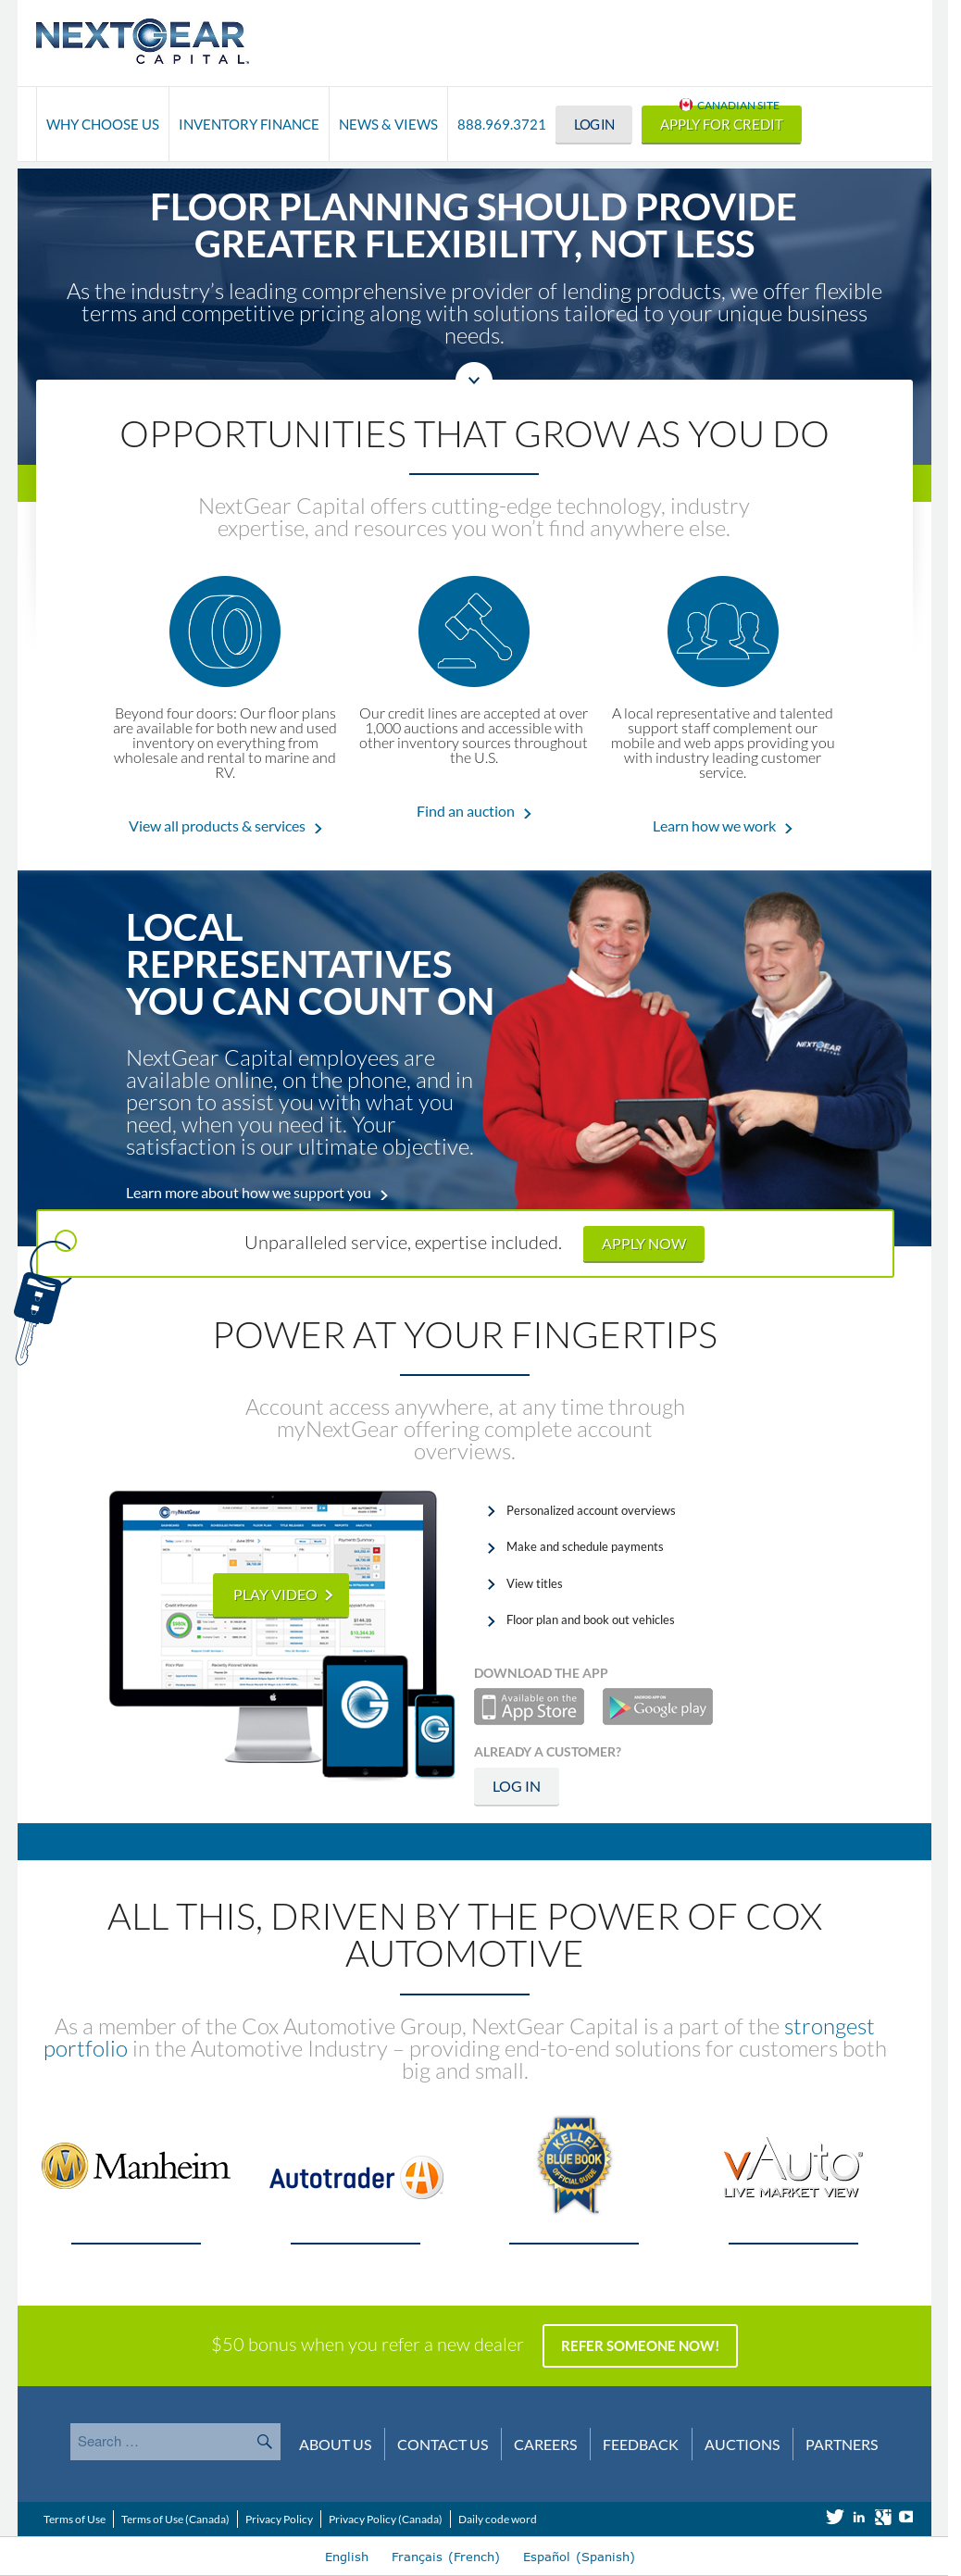 Nextgear Capital Competitors Revenue And Employees Owler